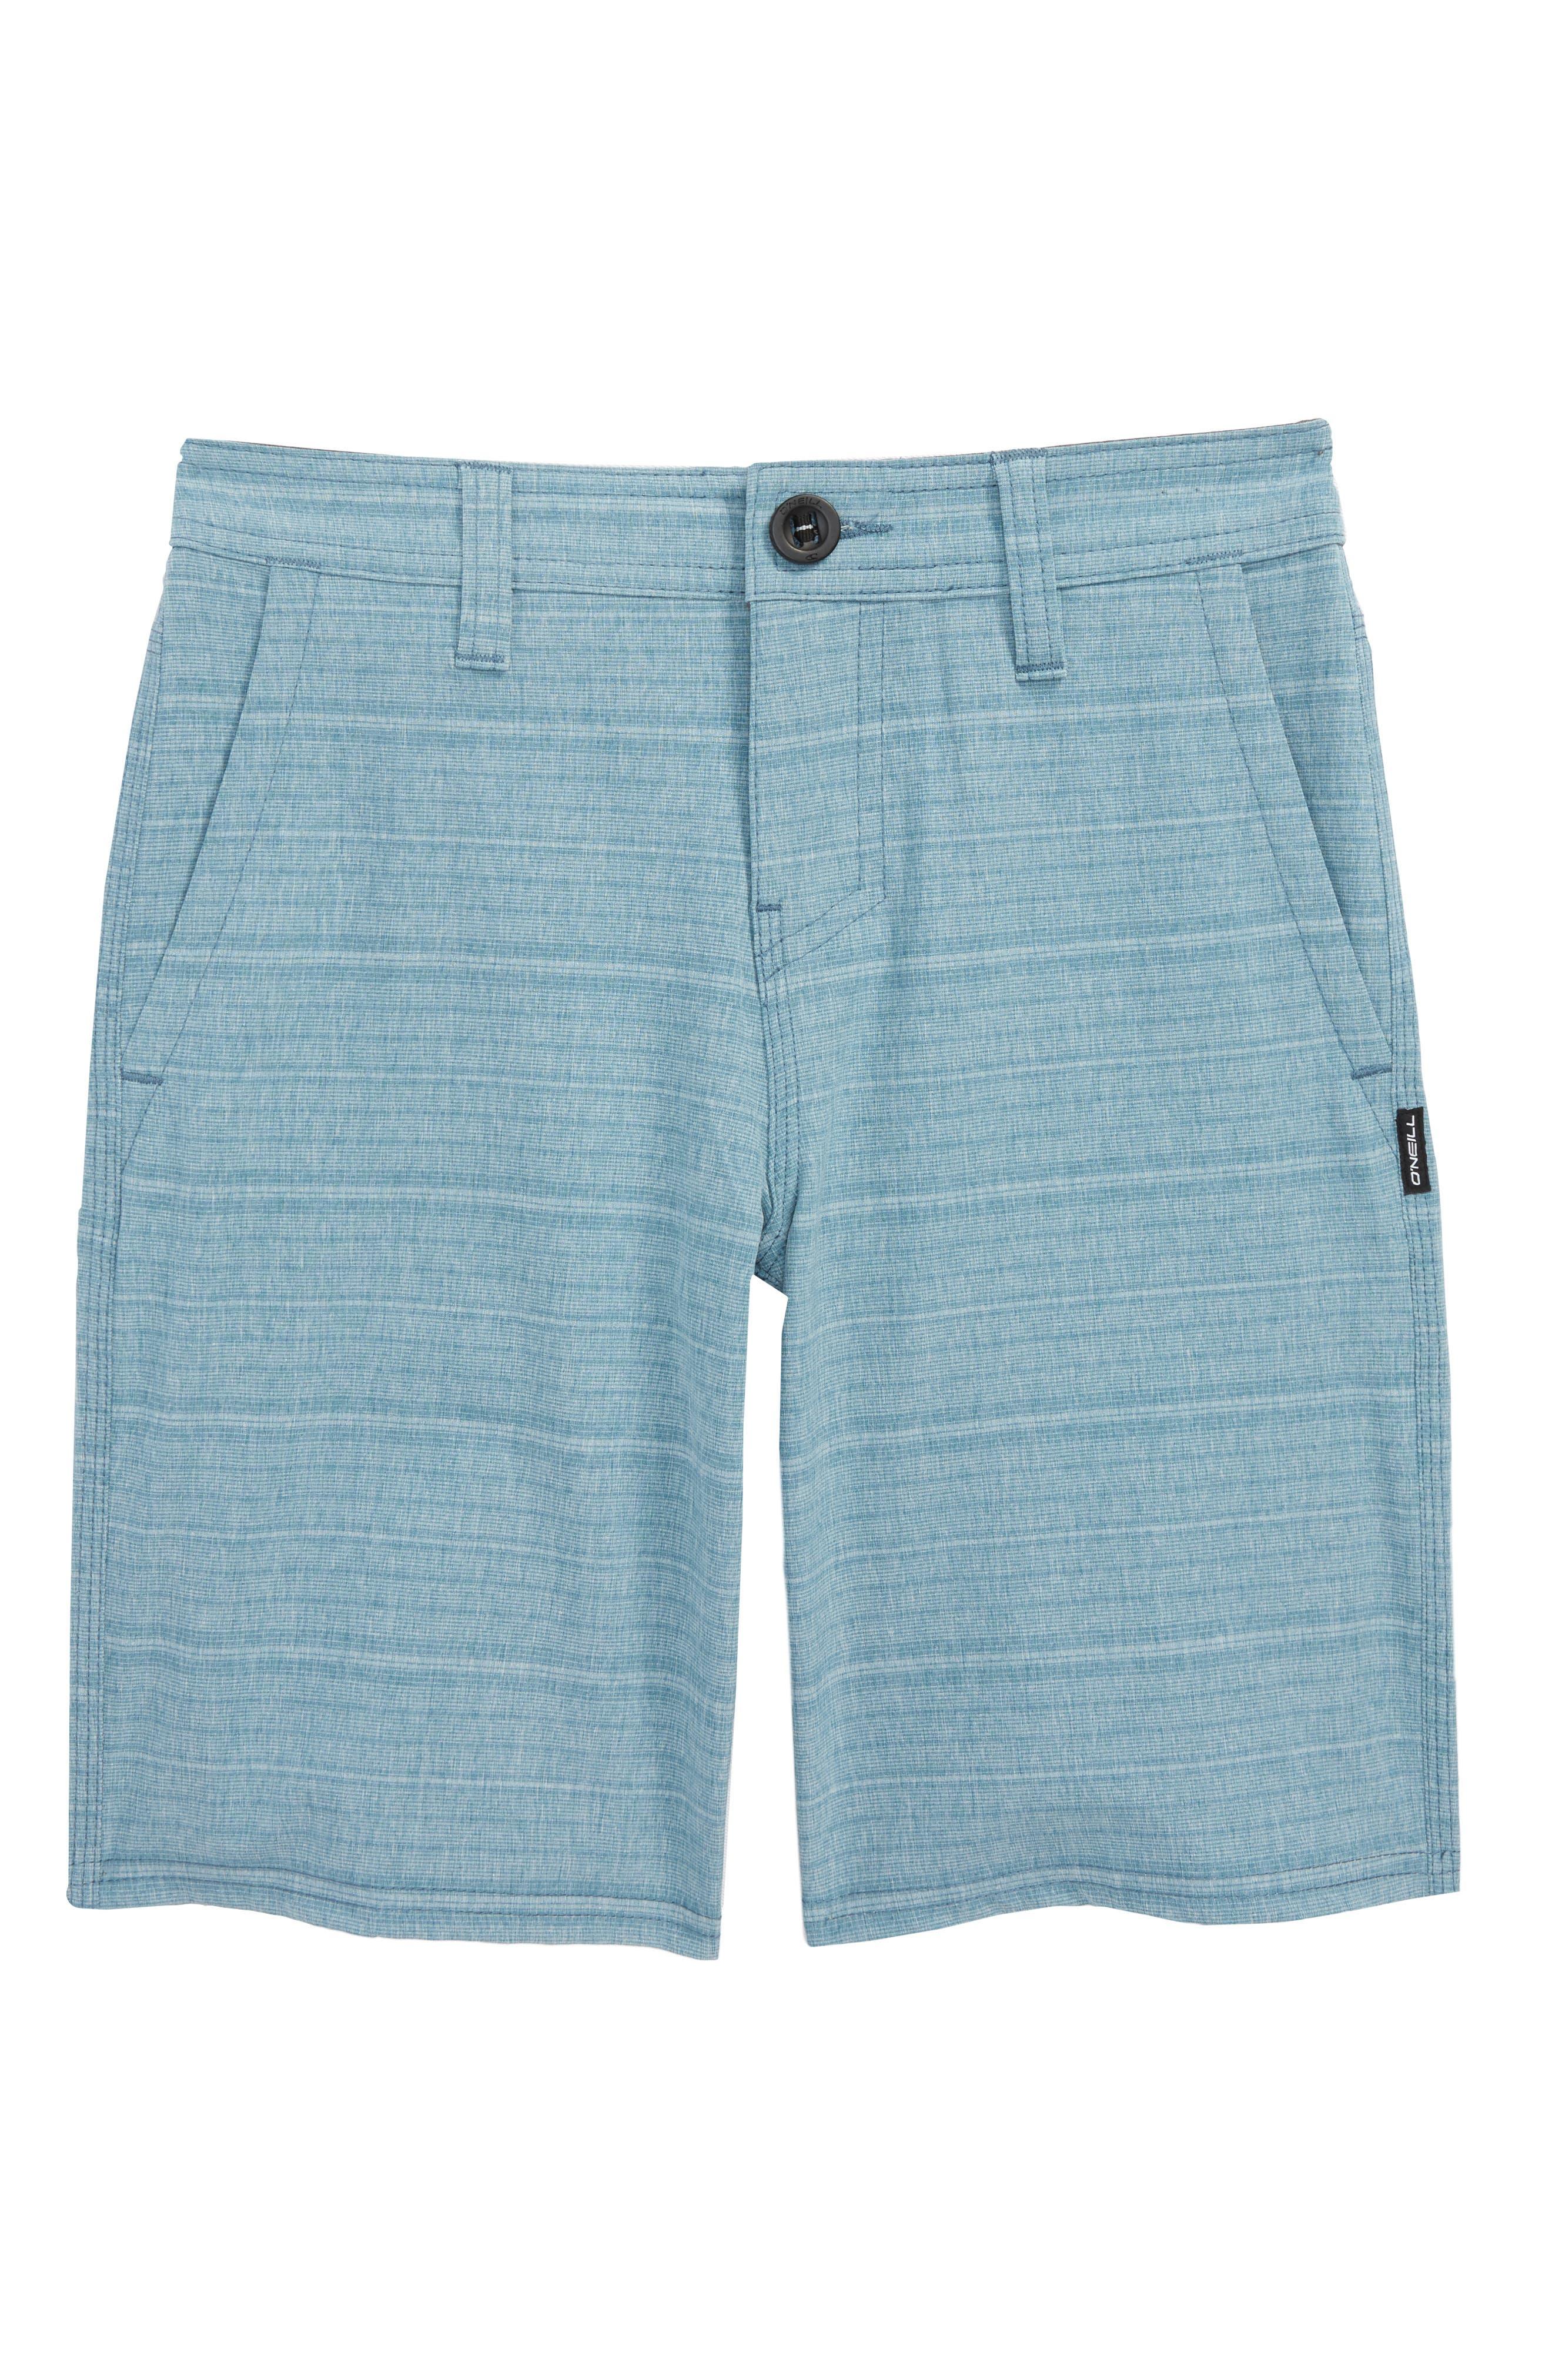 Locked Stripe Hybrid Shorts,                             Main thumbnail 1, color,                             Deep Teal